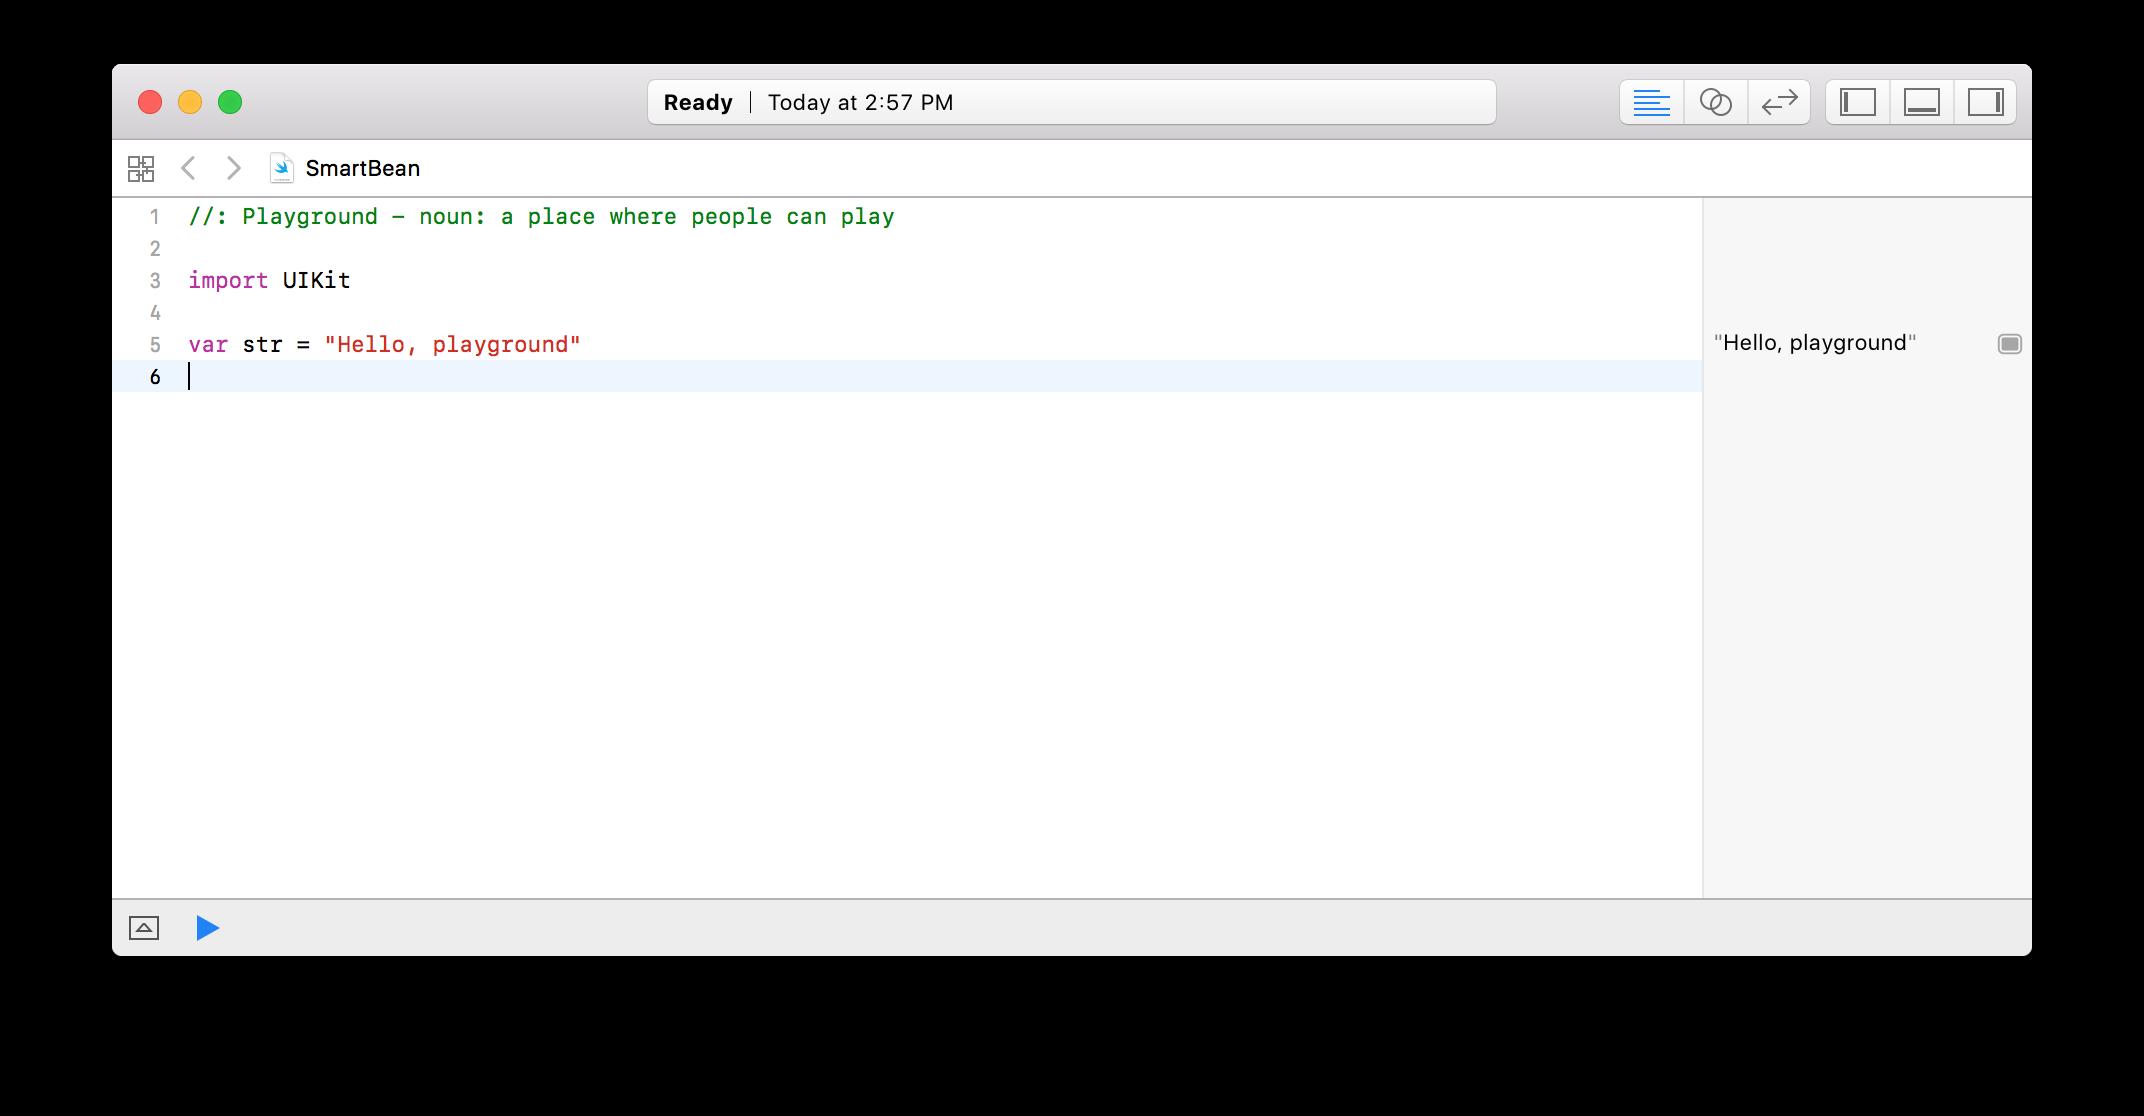 New Playground editor window